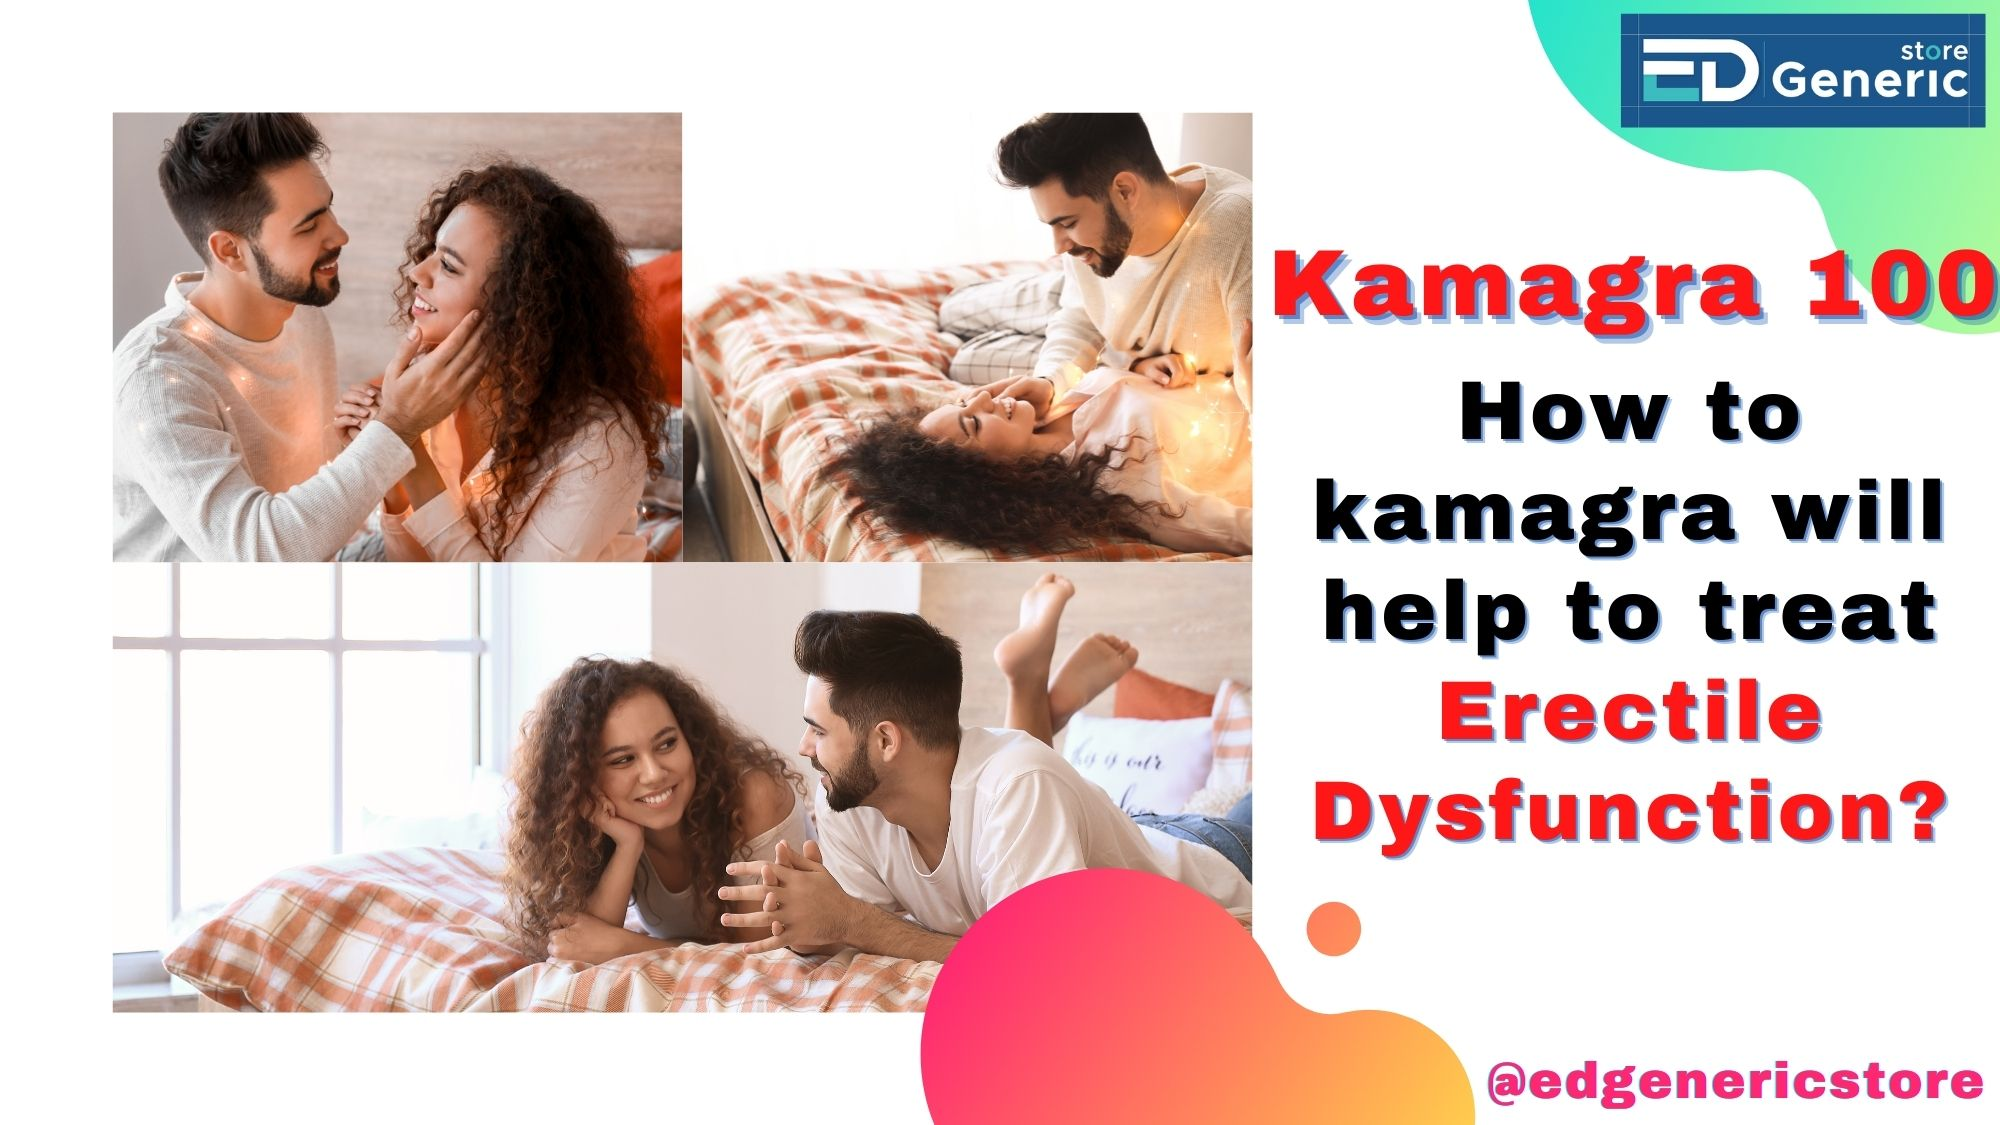 Kamagra 100 will help to treat ED